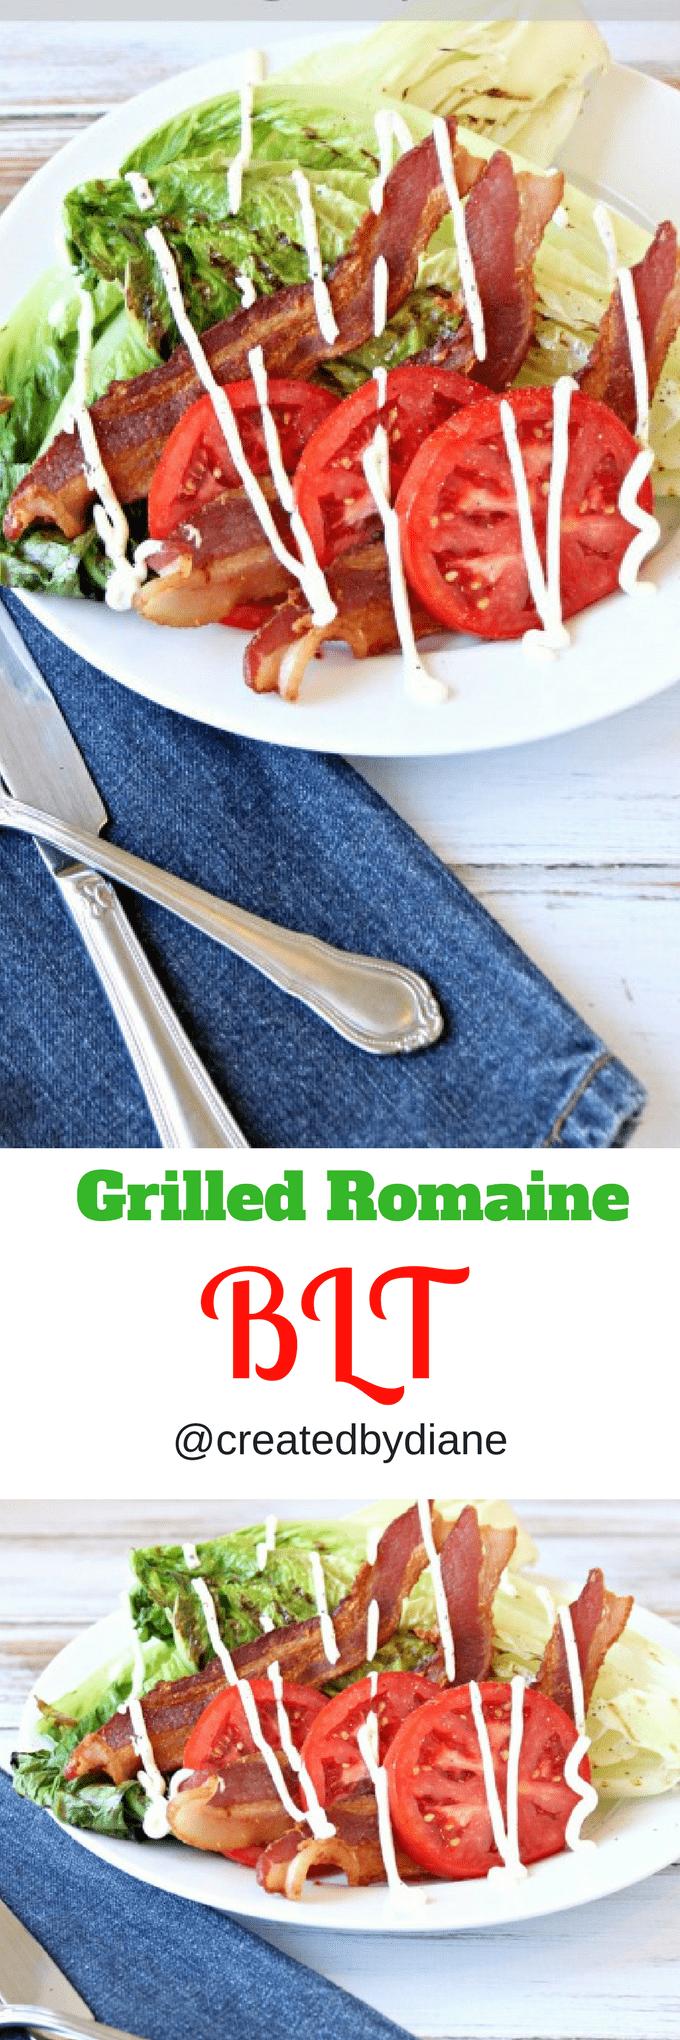 Grilled Romaine BLT Salad with Yogurt Dressing | Created ...